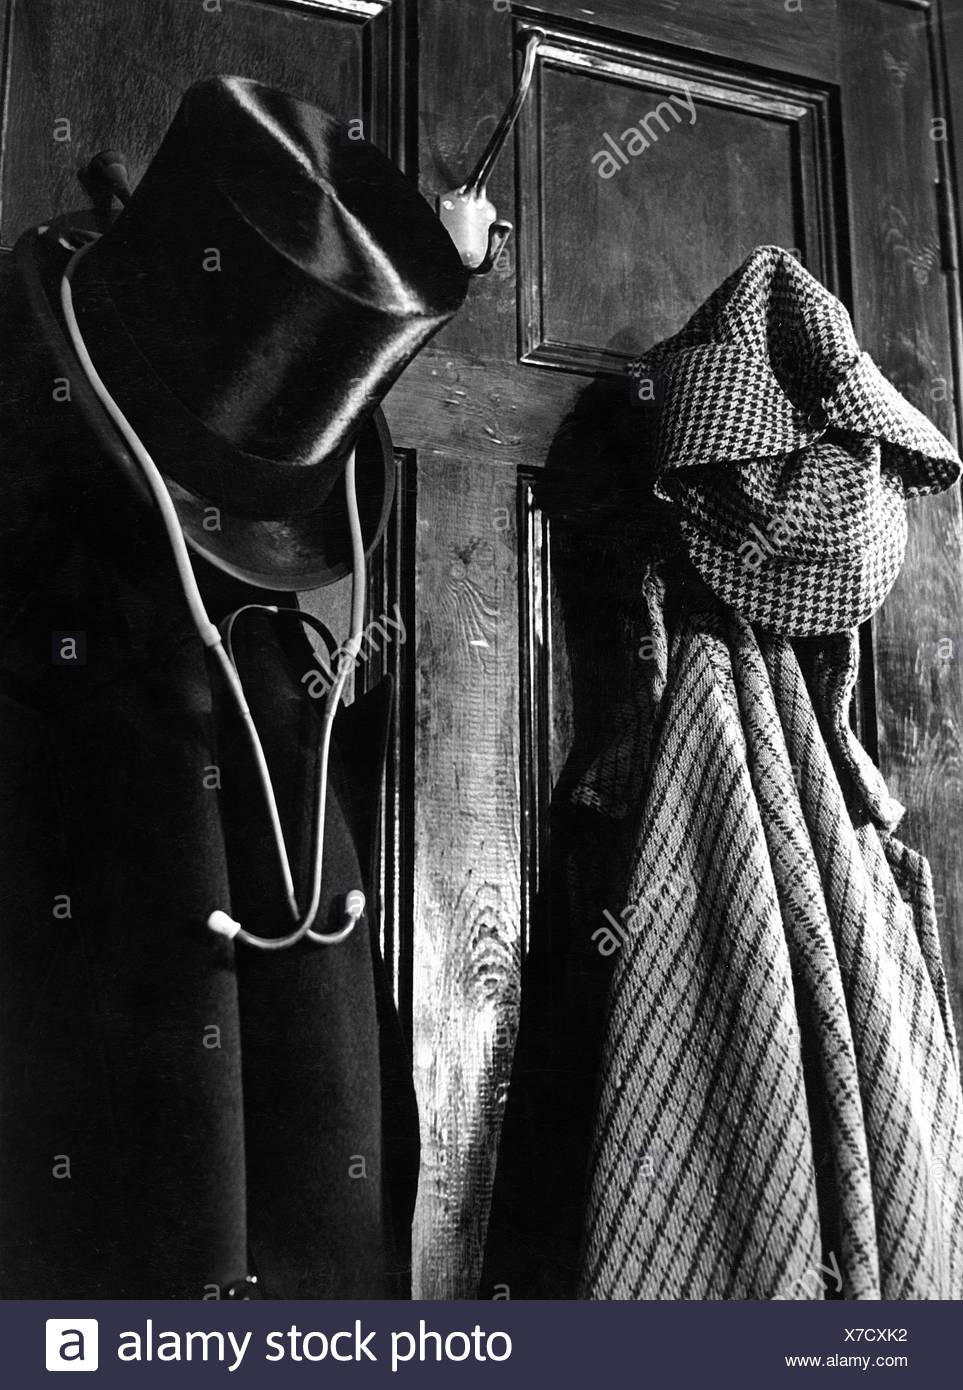 Sherlock Holmes, hero of novel, by Sir Arthur Conan Doyle, garment of Sherlock Holmes and Dr. Watson, Additional-Rights-Clearances-NA - Stock Image